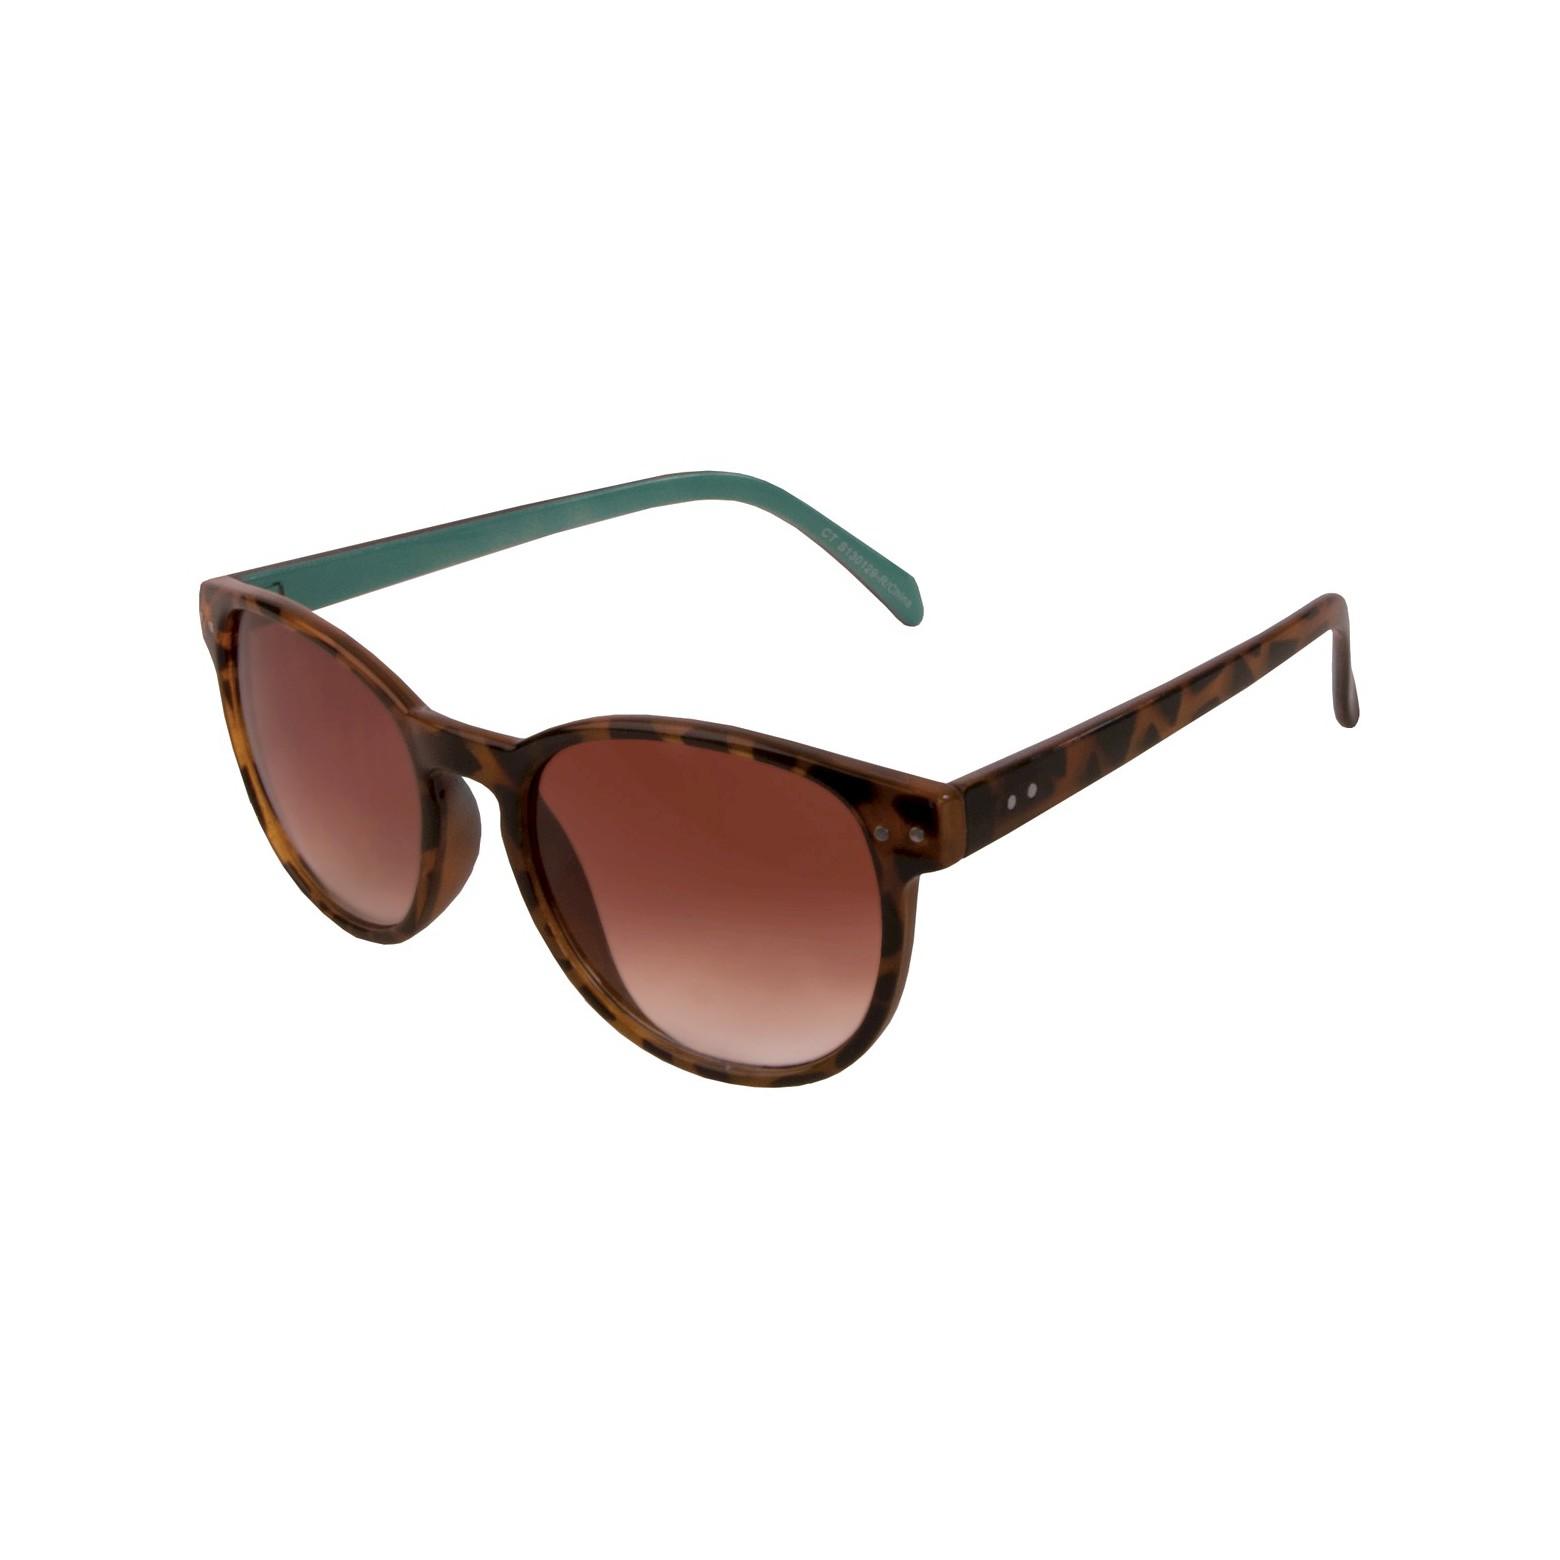 Target tortoise brown sunglasses